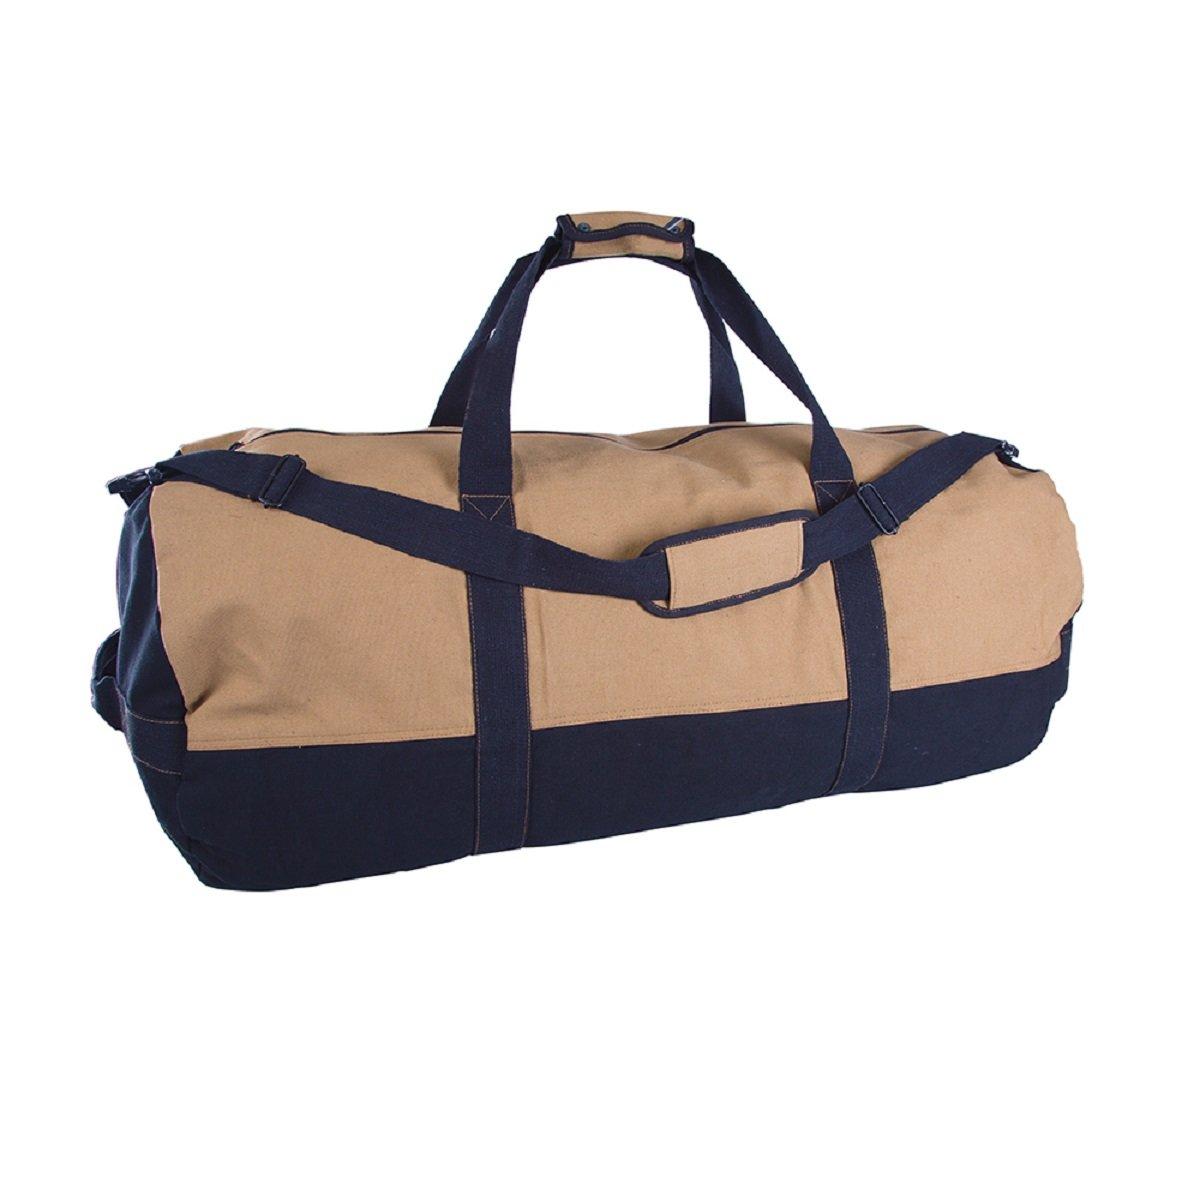 DUFFLE BAG WITH ZIPPER - 2 TONE - 18 IN X 36 IN, Case of 6